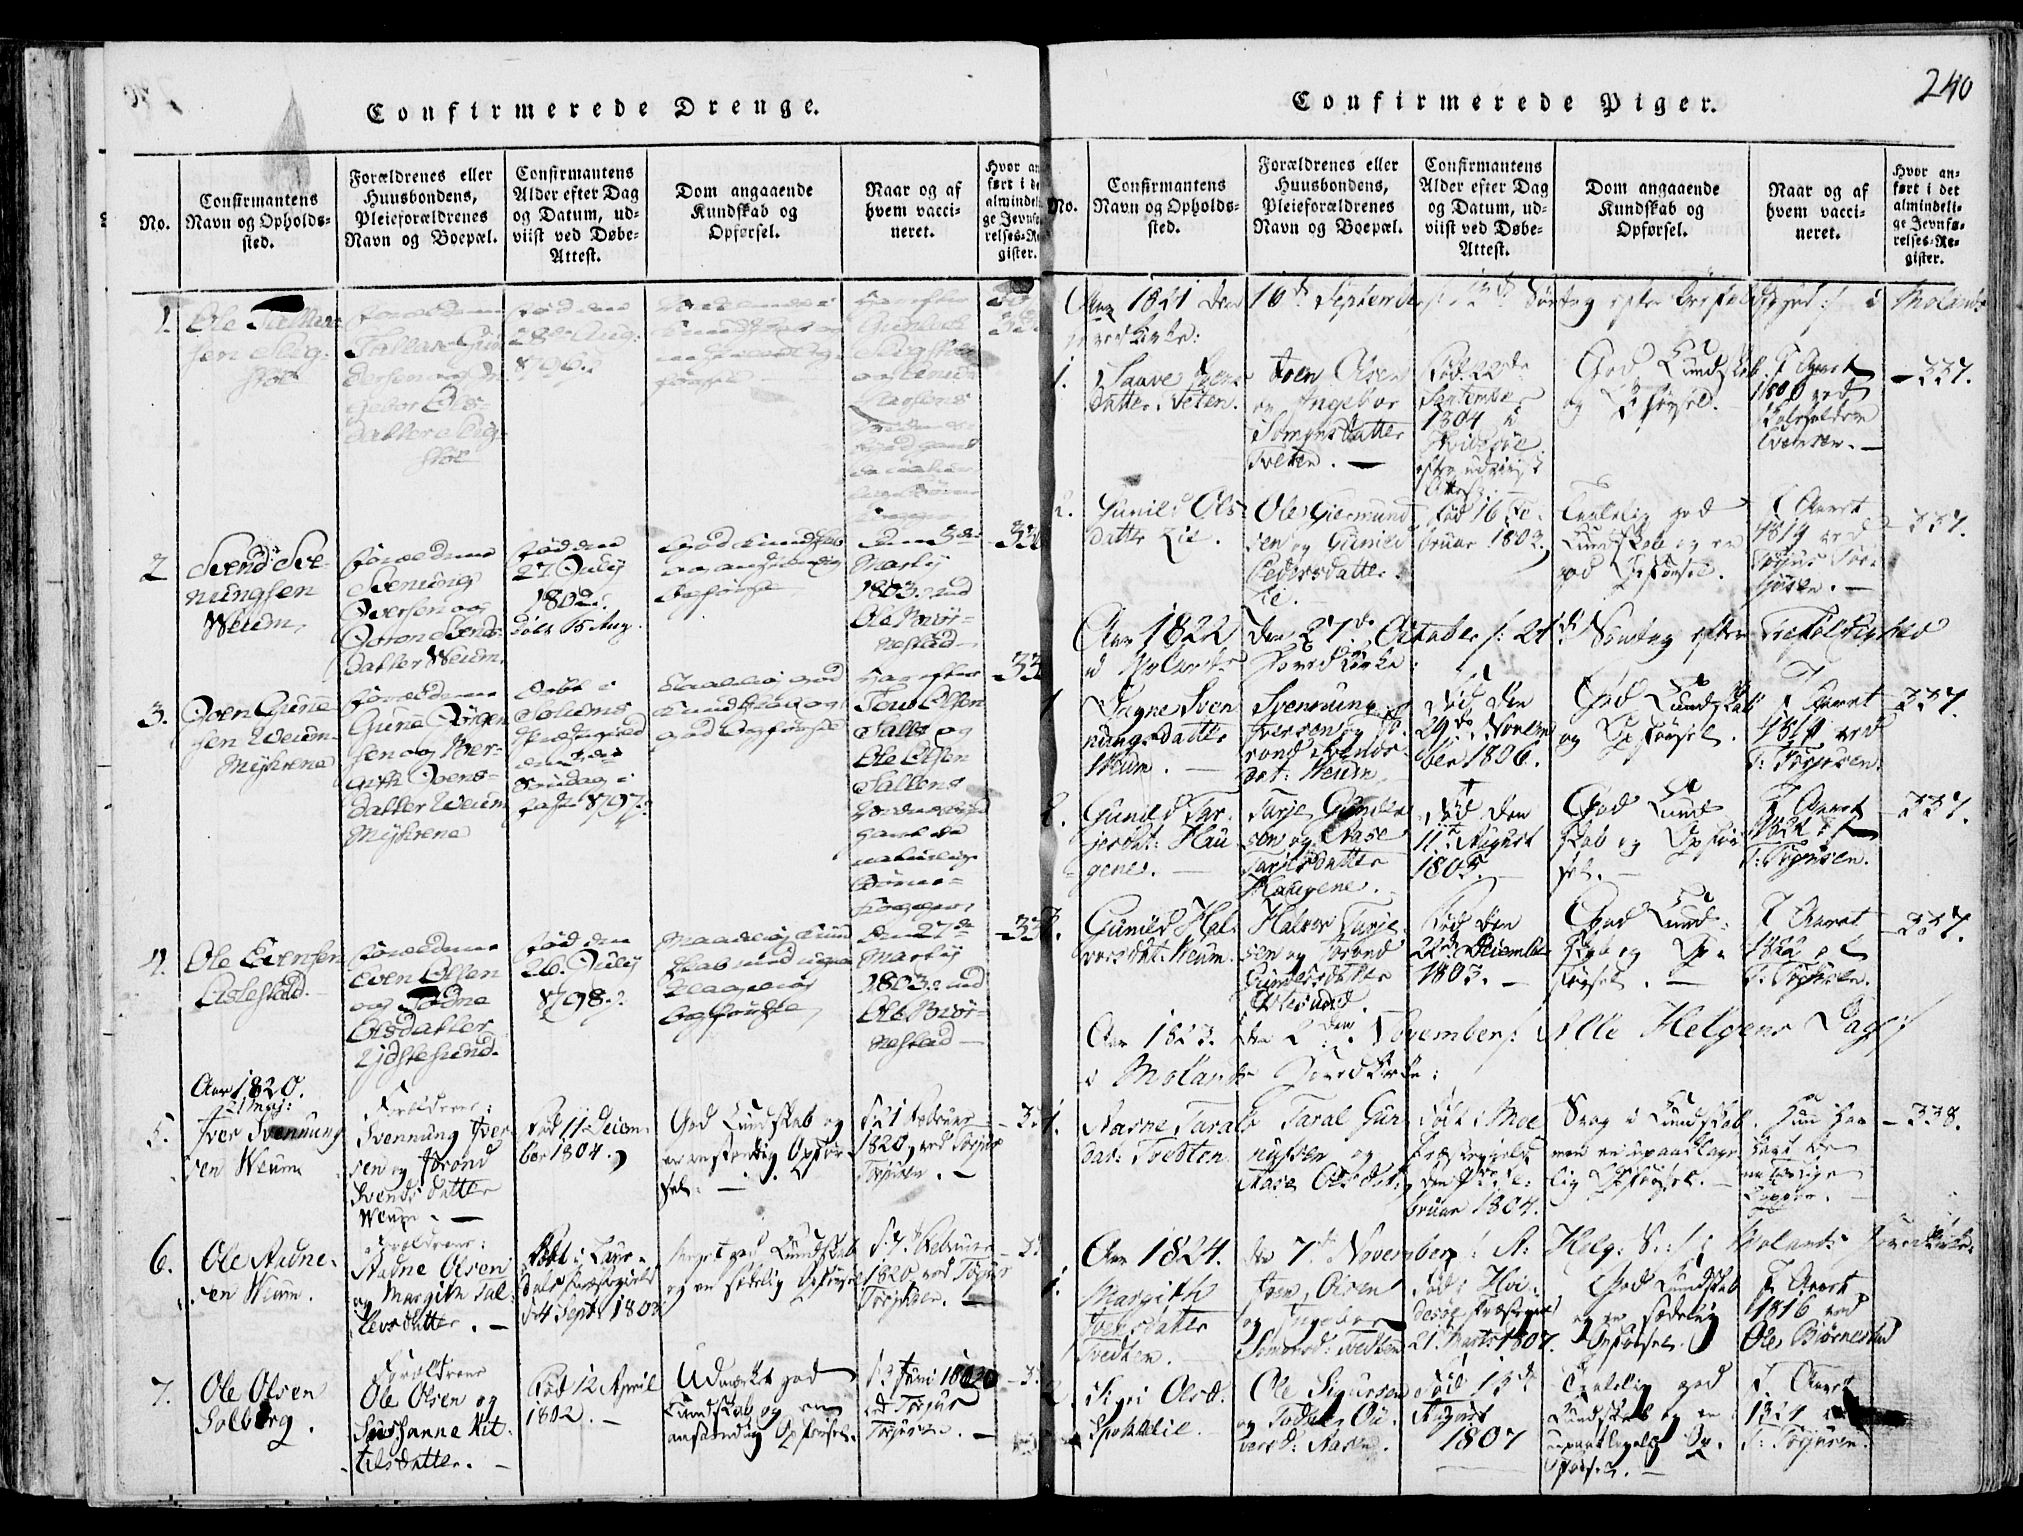 SAKO, Fyresdal kirkebøker, F/Fb/L0001: Ministerialbok nr. II 1, 1815-1854, s. 240